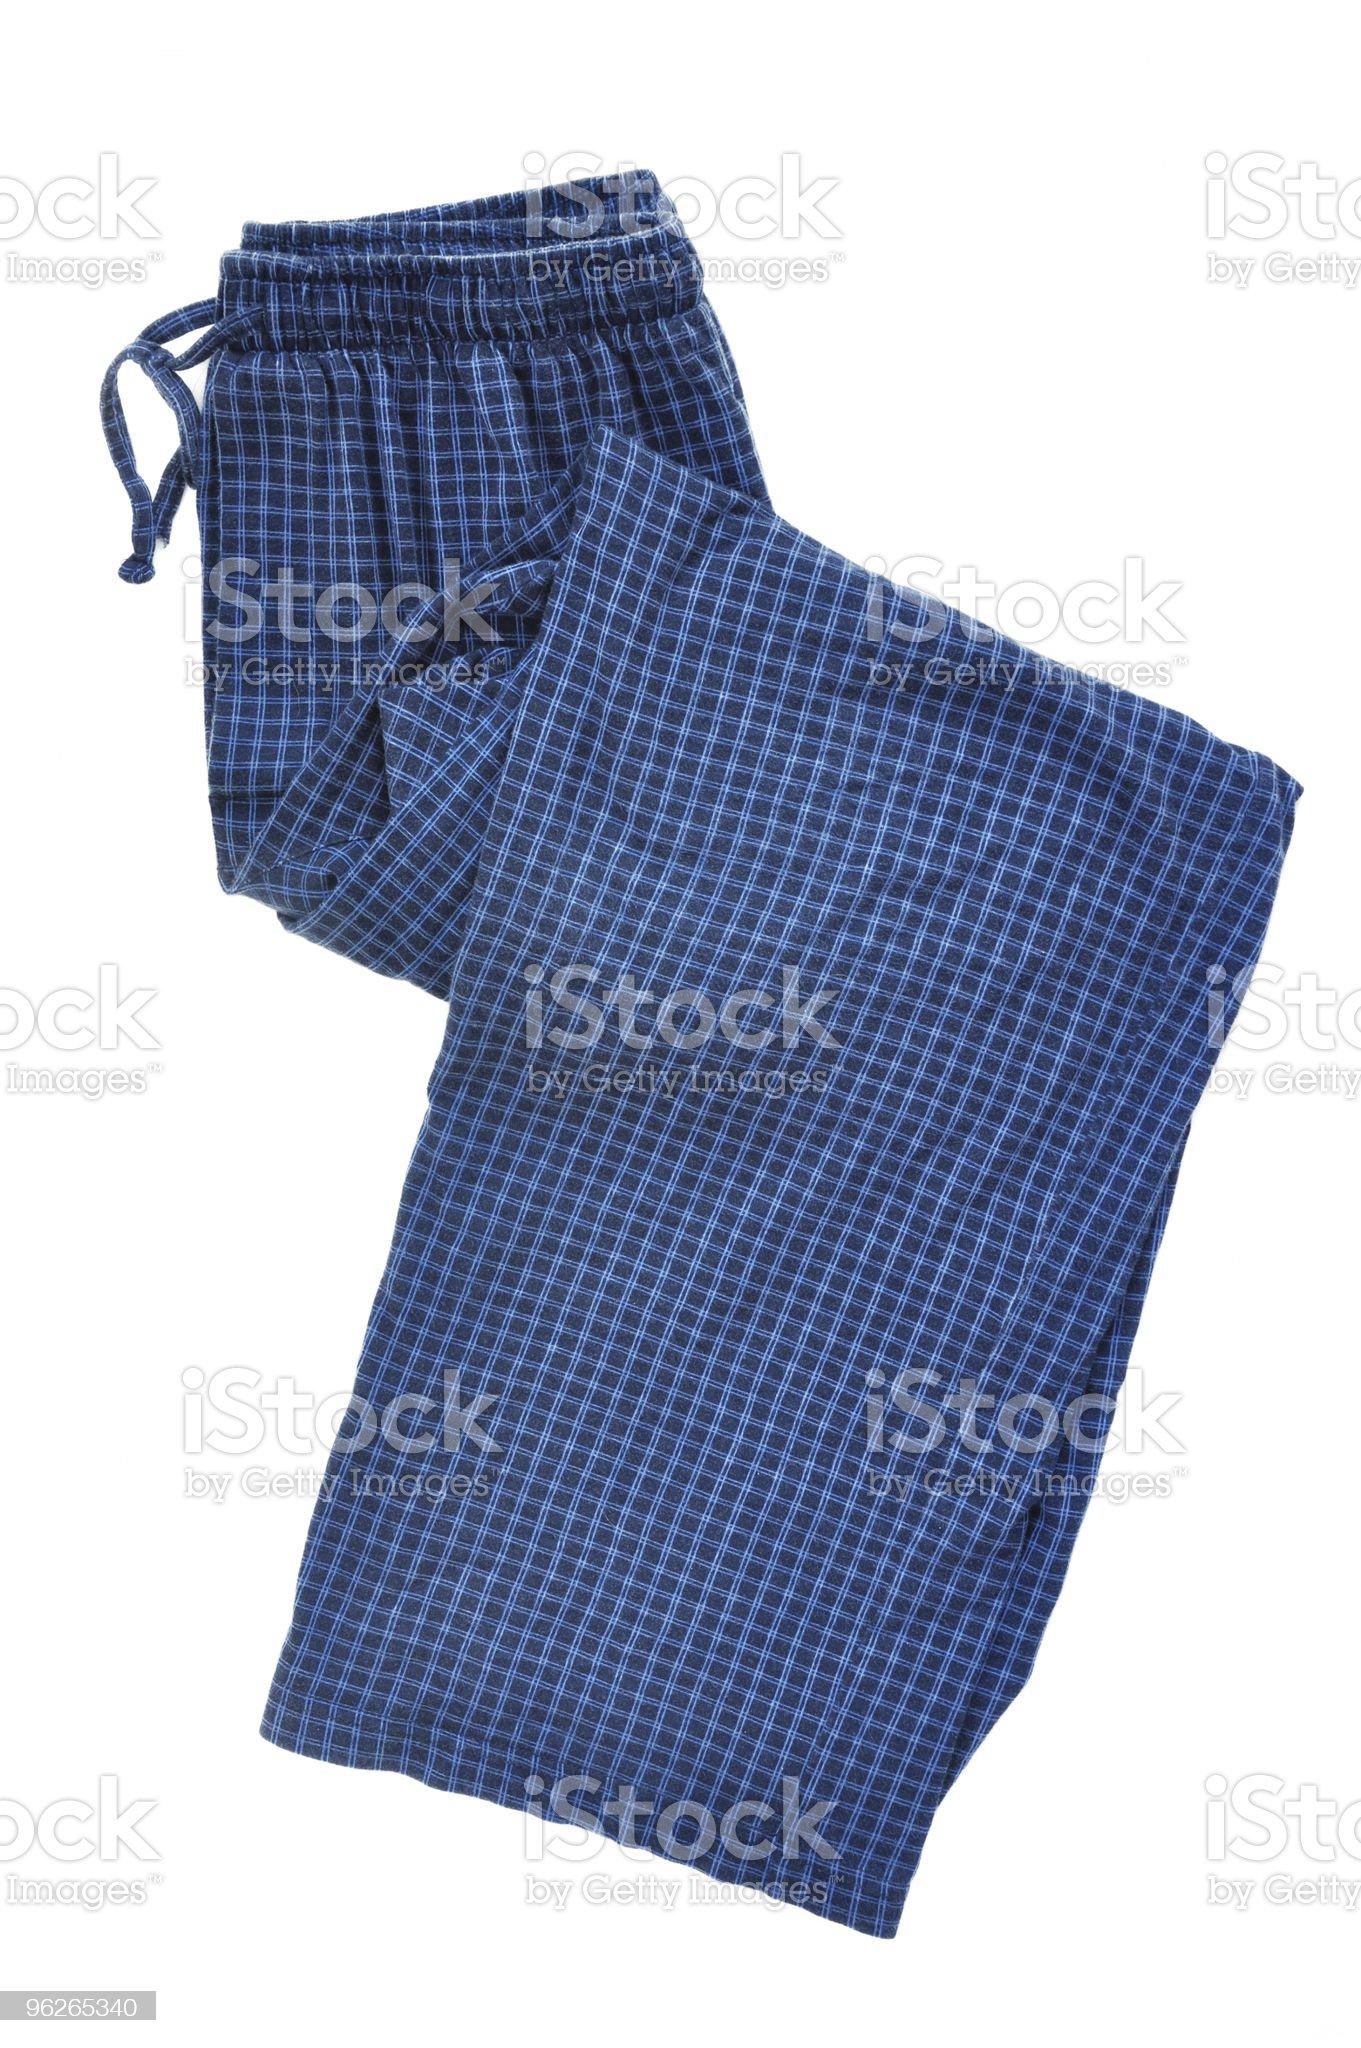 Blue Plaid Pajama Pants royalty-free stock photo